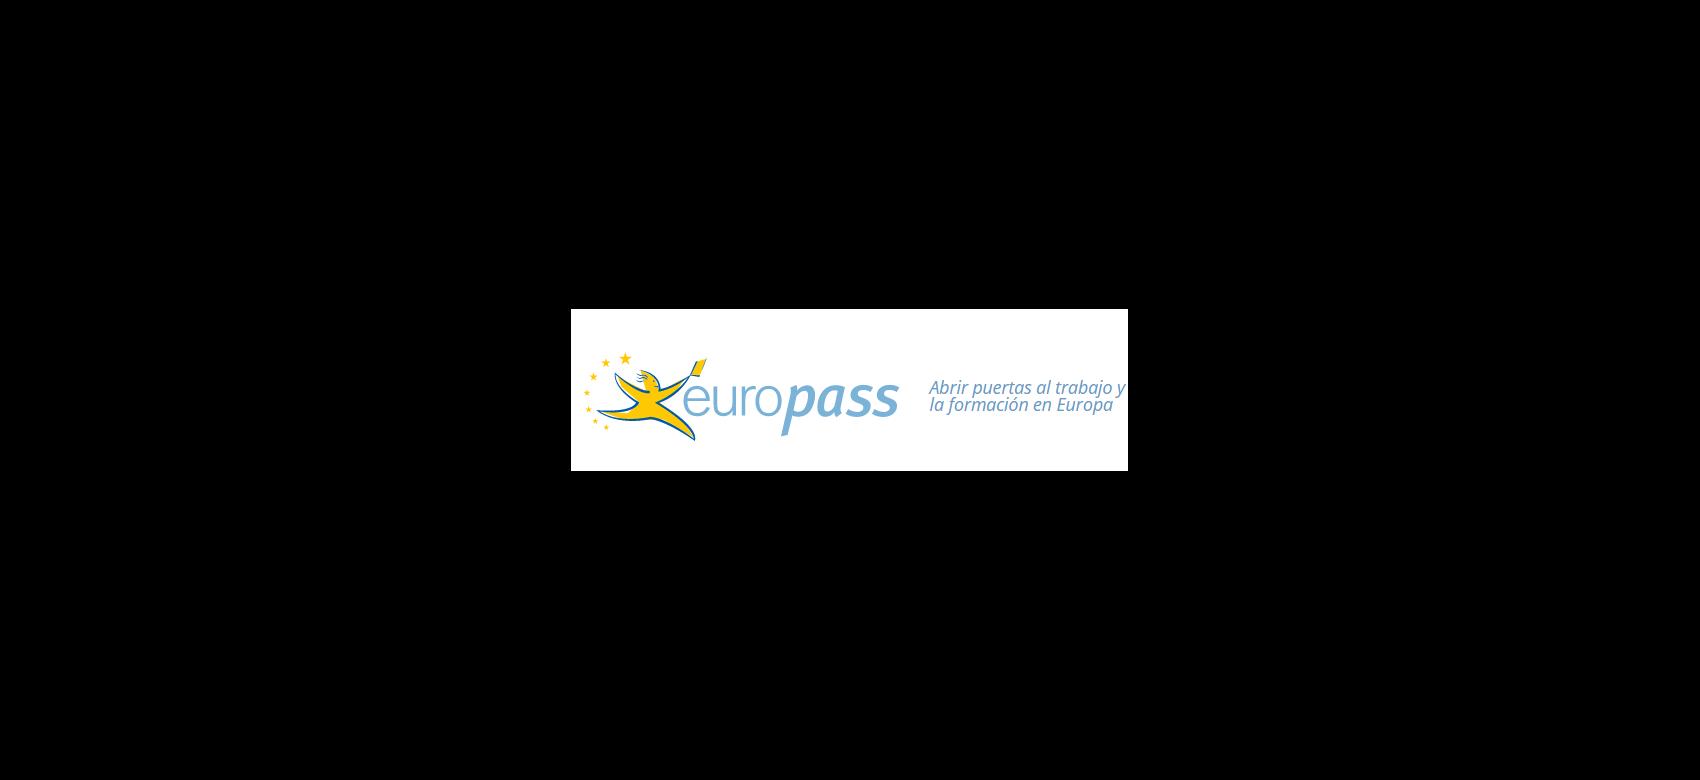 Página Europass de la Comisión Europea